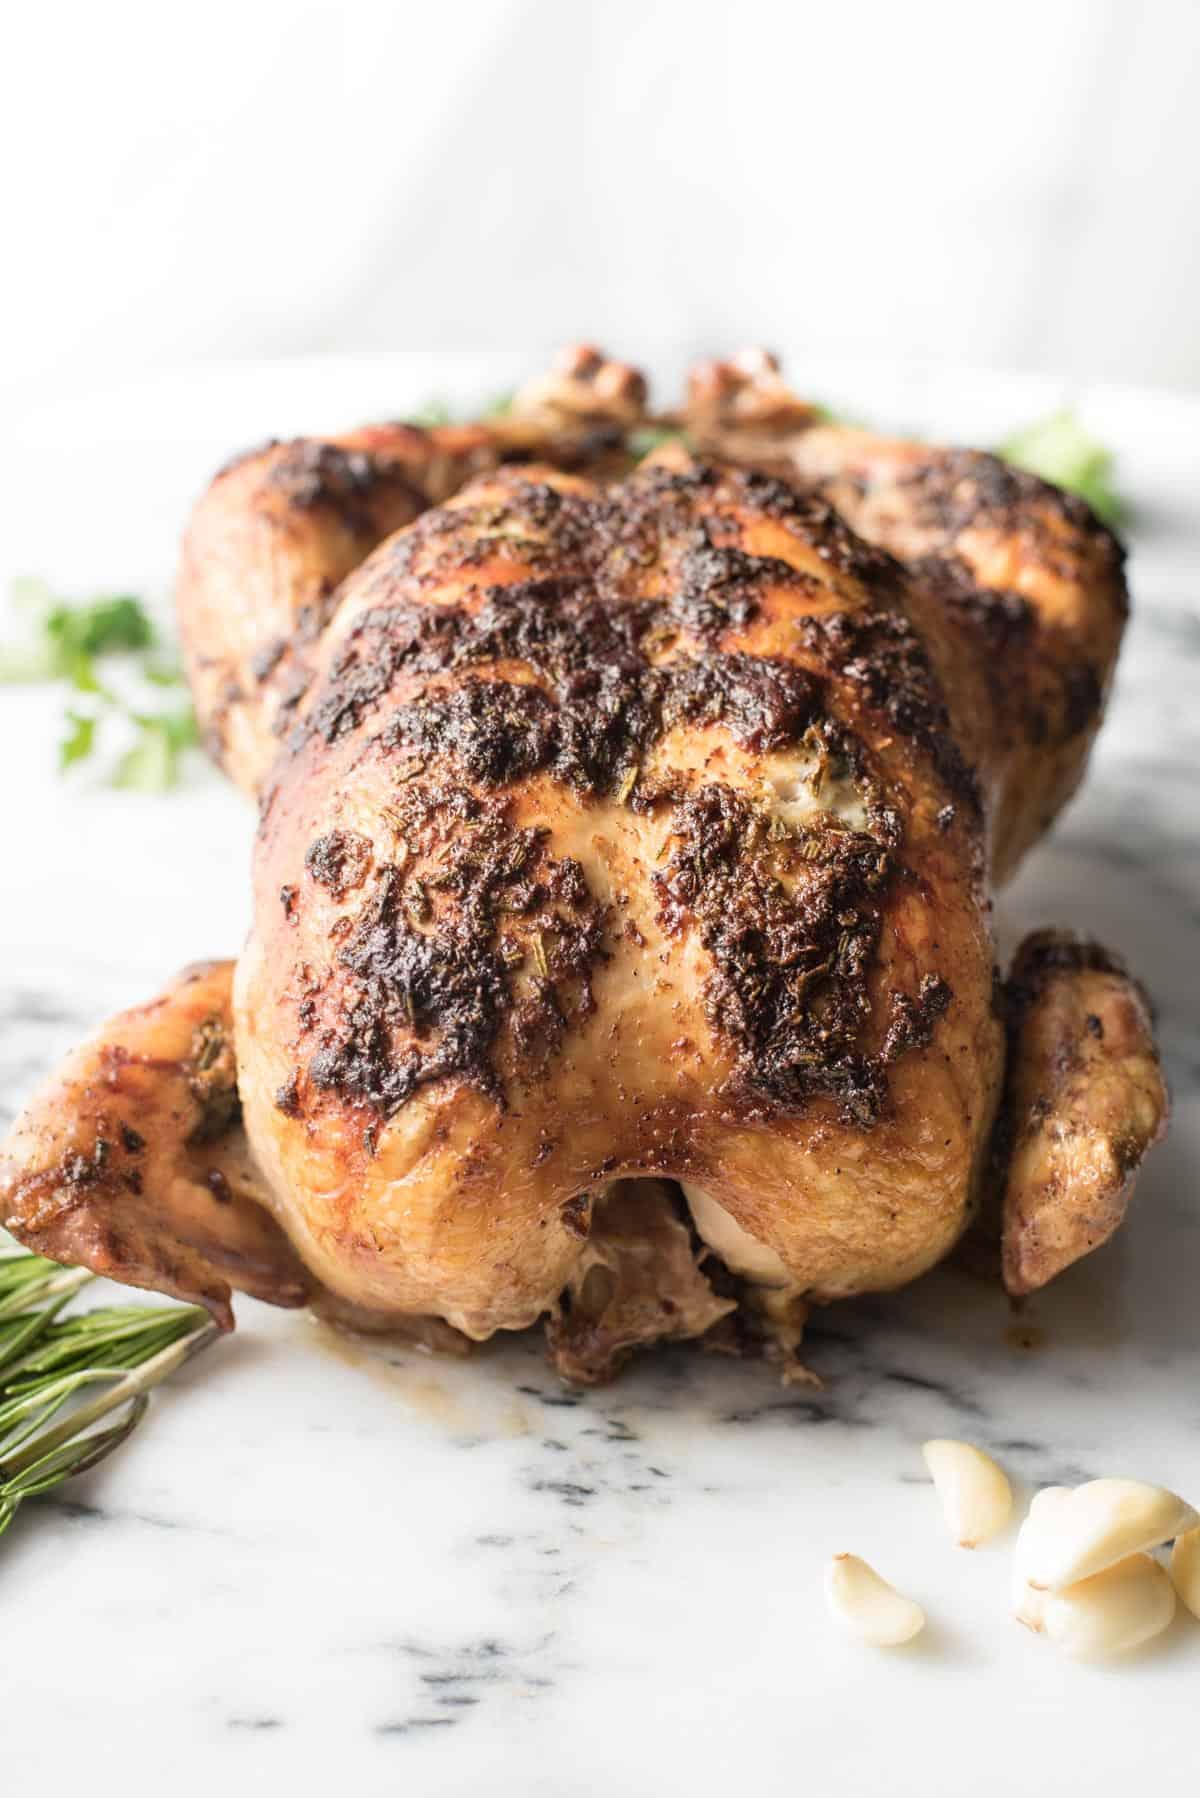 Juiciest Garlic Rosemary Roasted Chicken